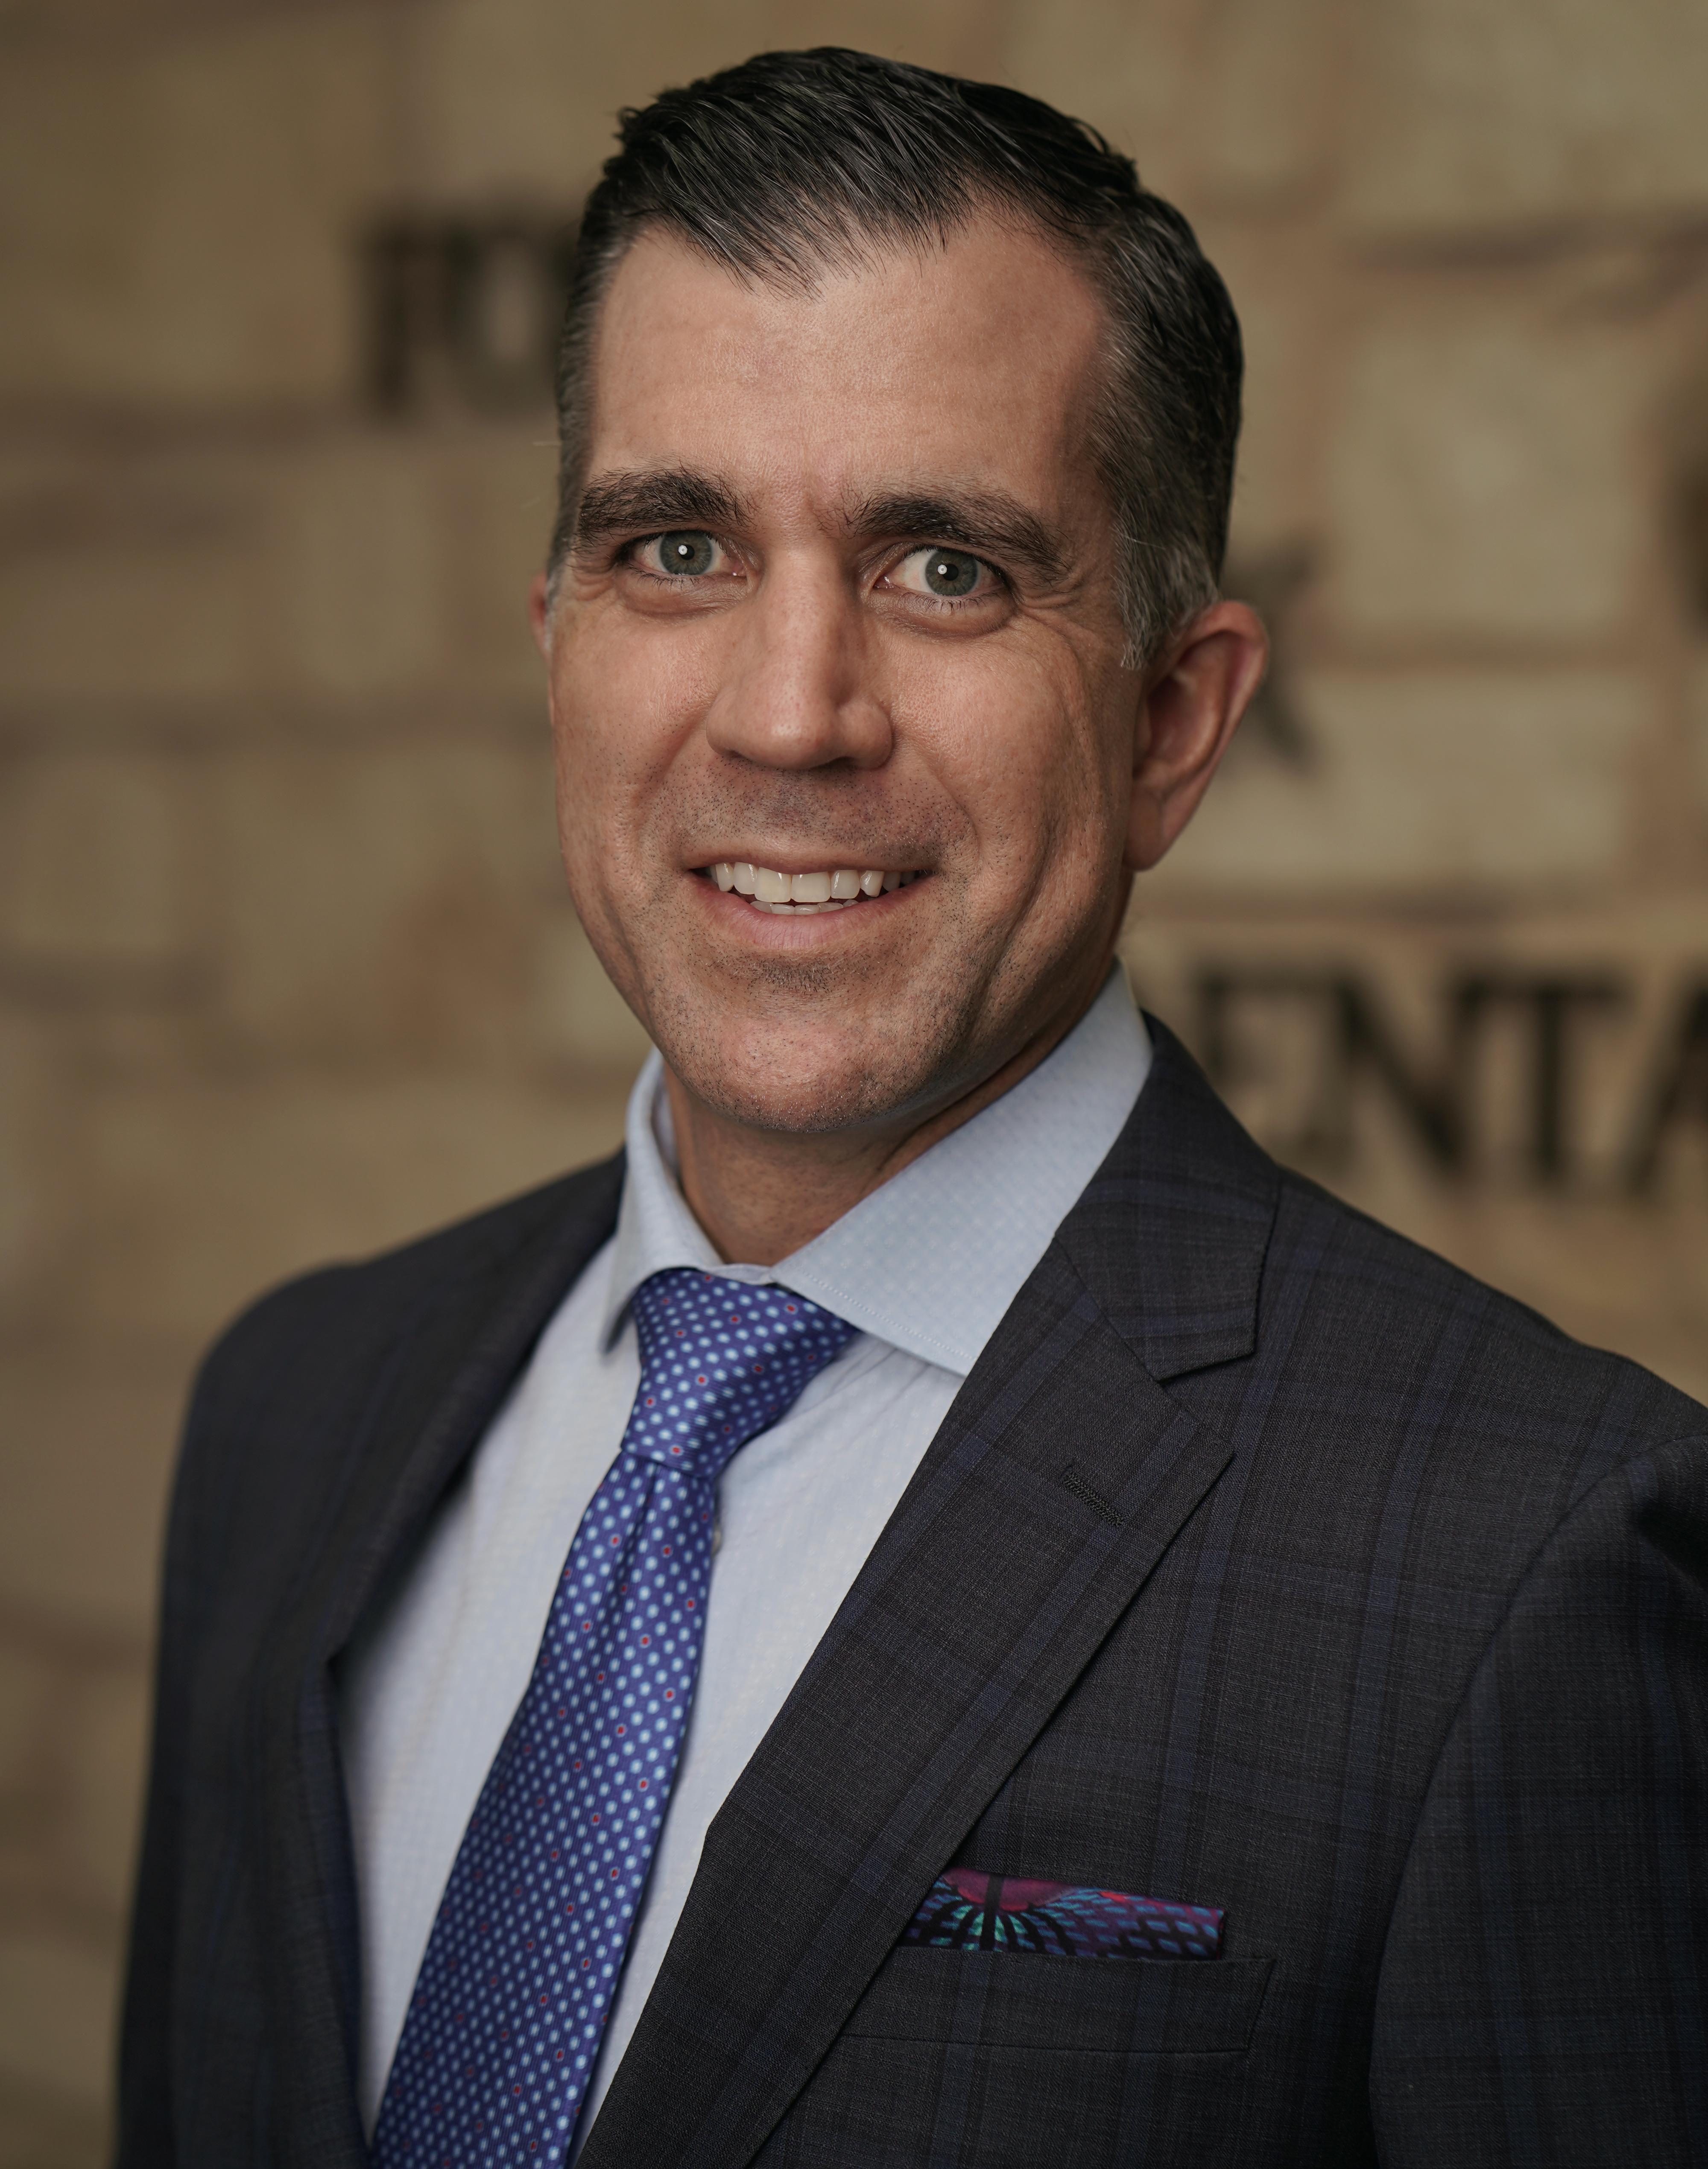 Dr. Chad Duplantis